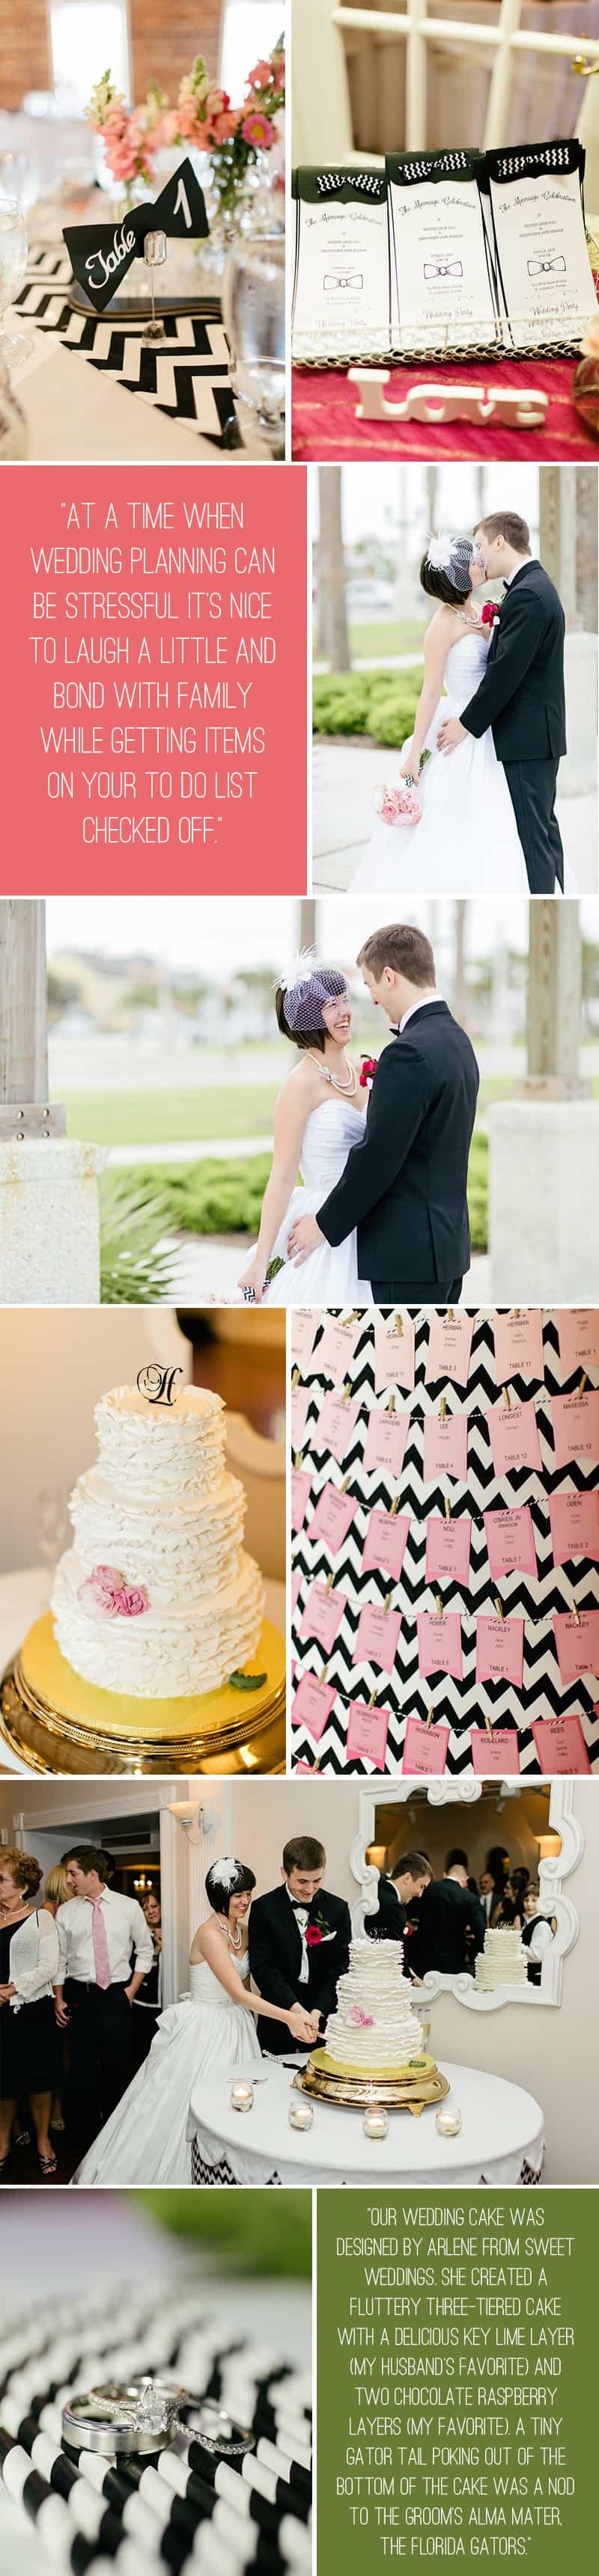 Black White Chevron Pink Wedding Florida Rooftop Wedding6